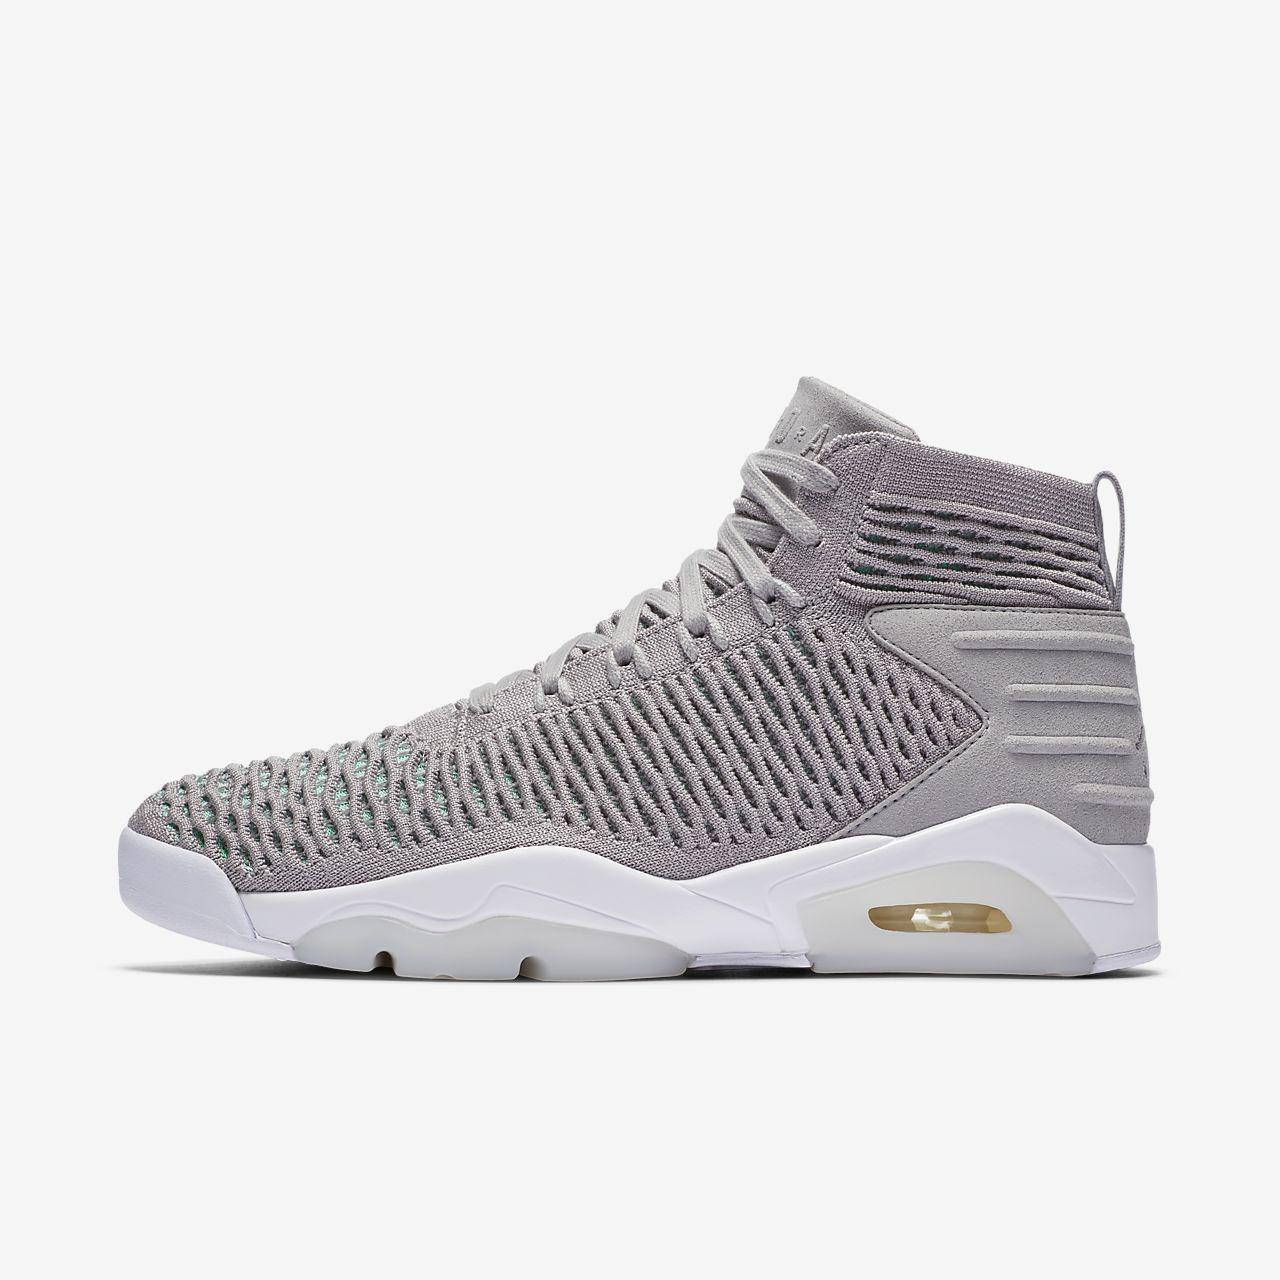 56c7fb6eaf4115 Jordan Flyknit Elevation 23 Men s Shoe. Nike.com MA